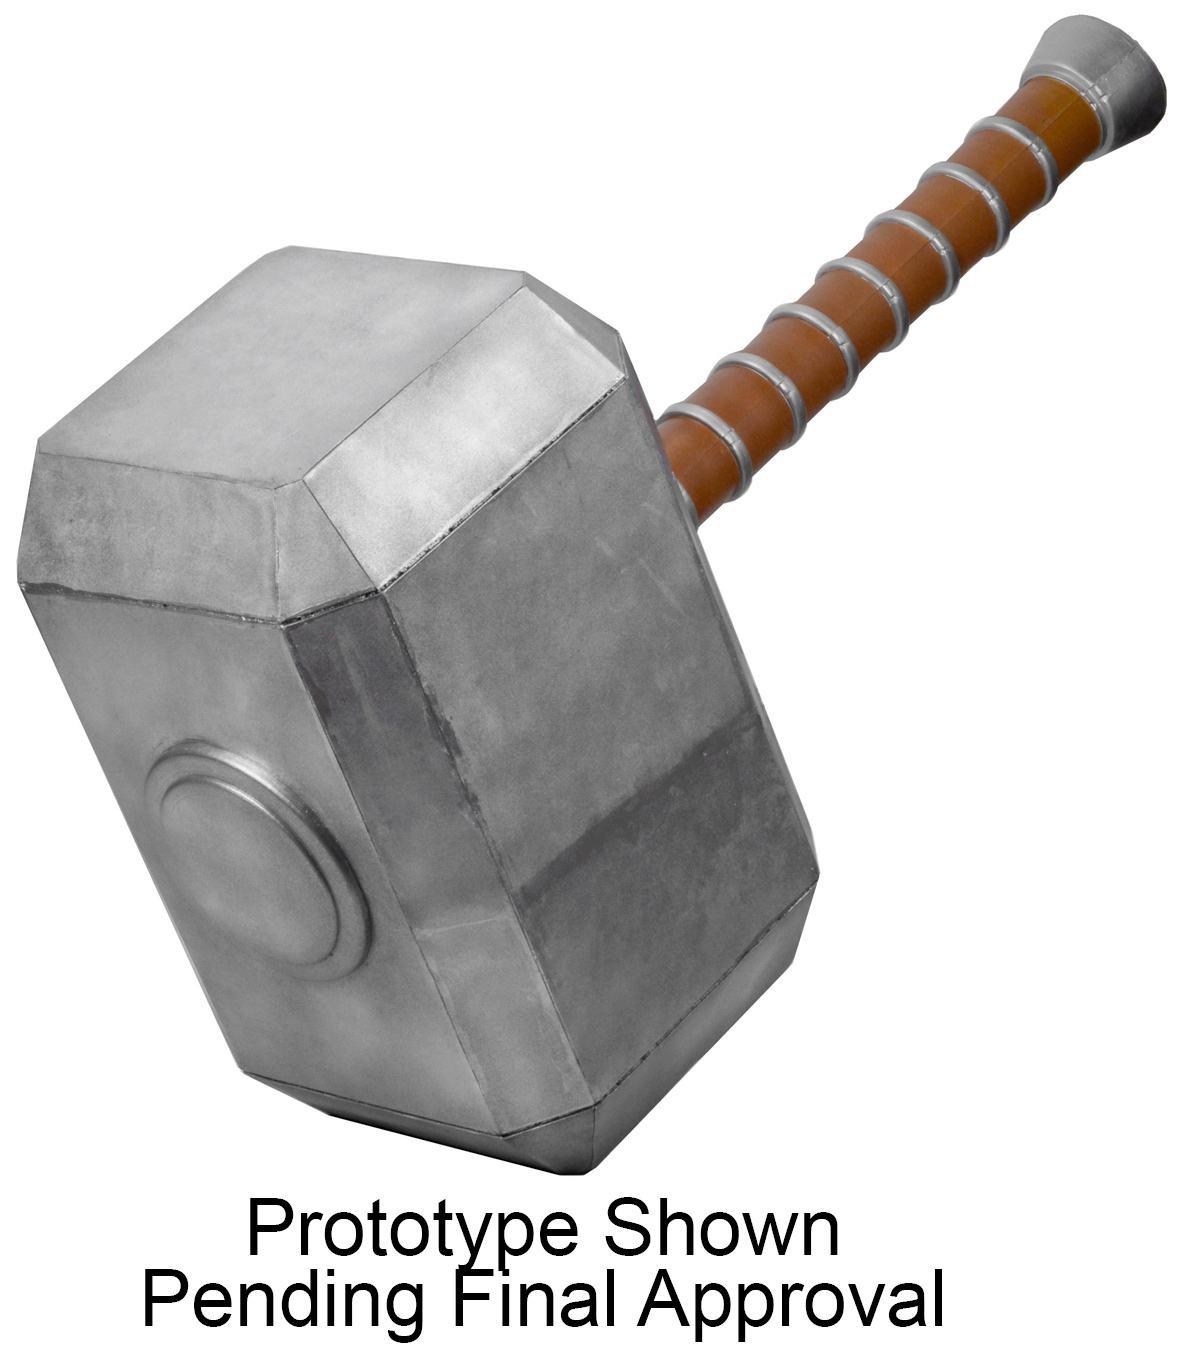 Martelo-Gigante-Thor-Hammer-Oversized-Foam-Prop-Replica-02